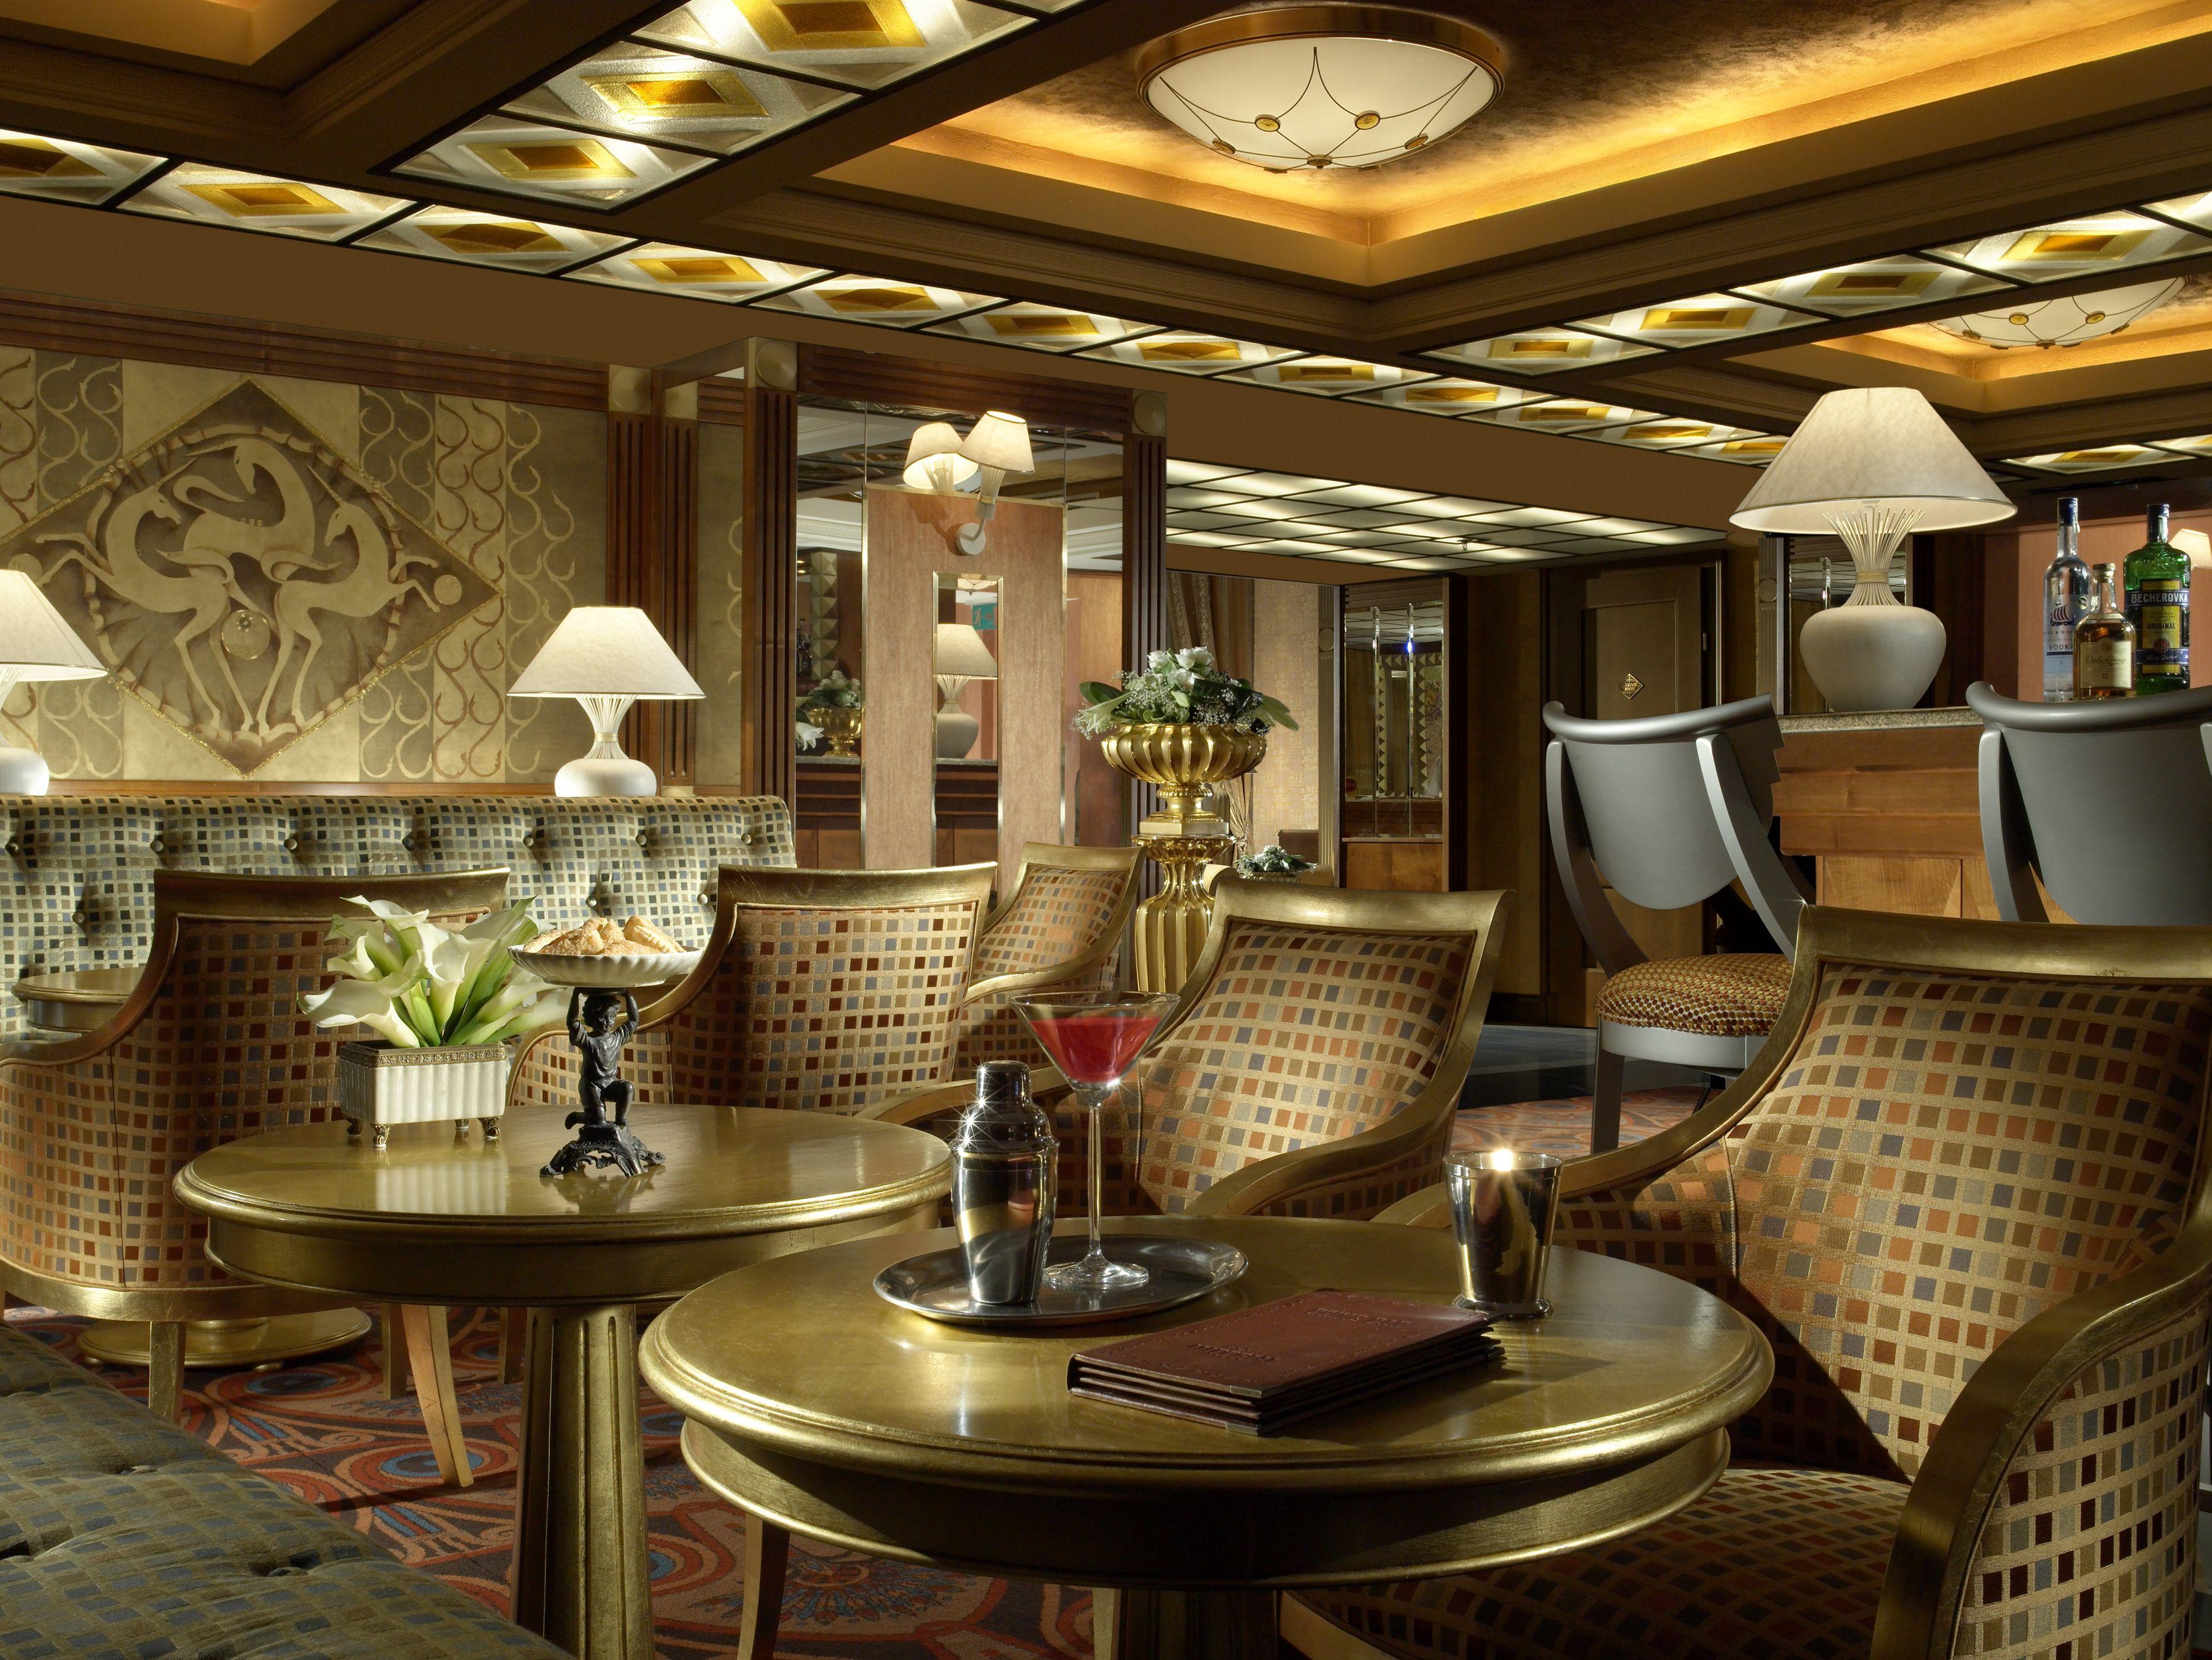 Modern Hotel Interior Design With Golden Furniture. Feel